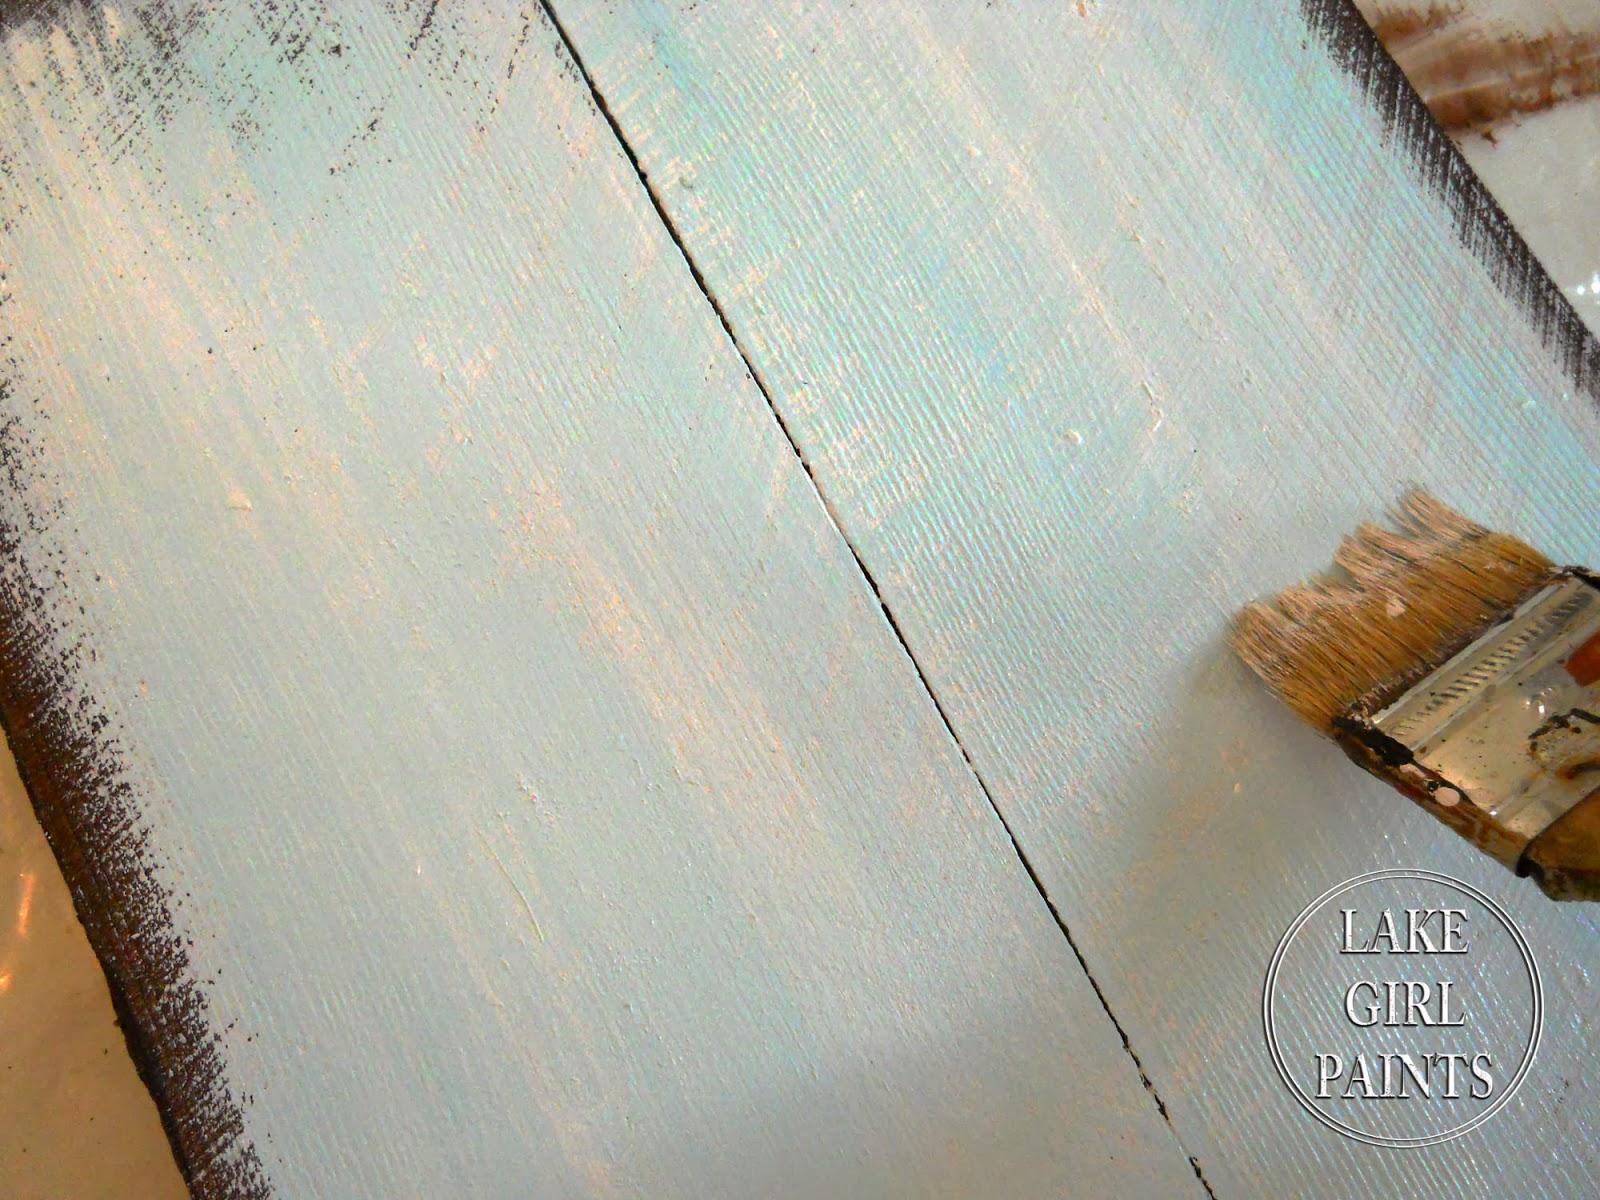 Lake Girl Paints Rustic Winter Art Group